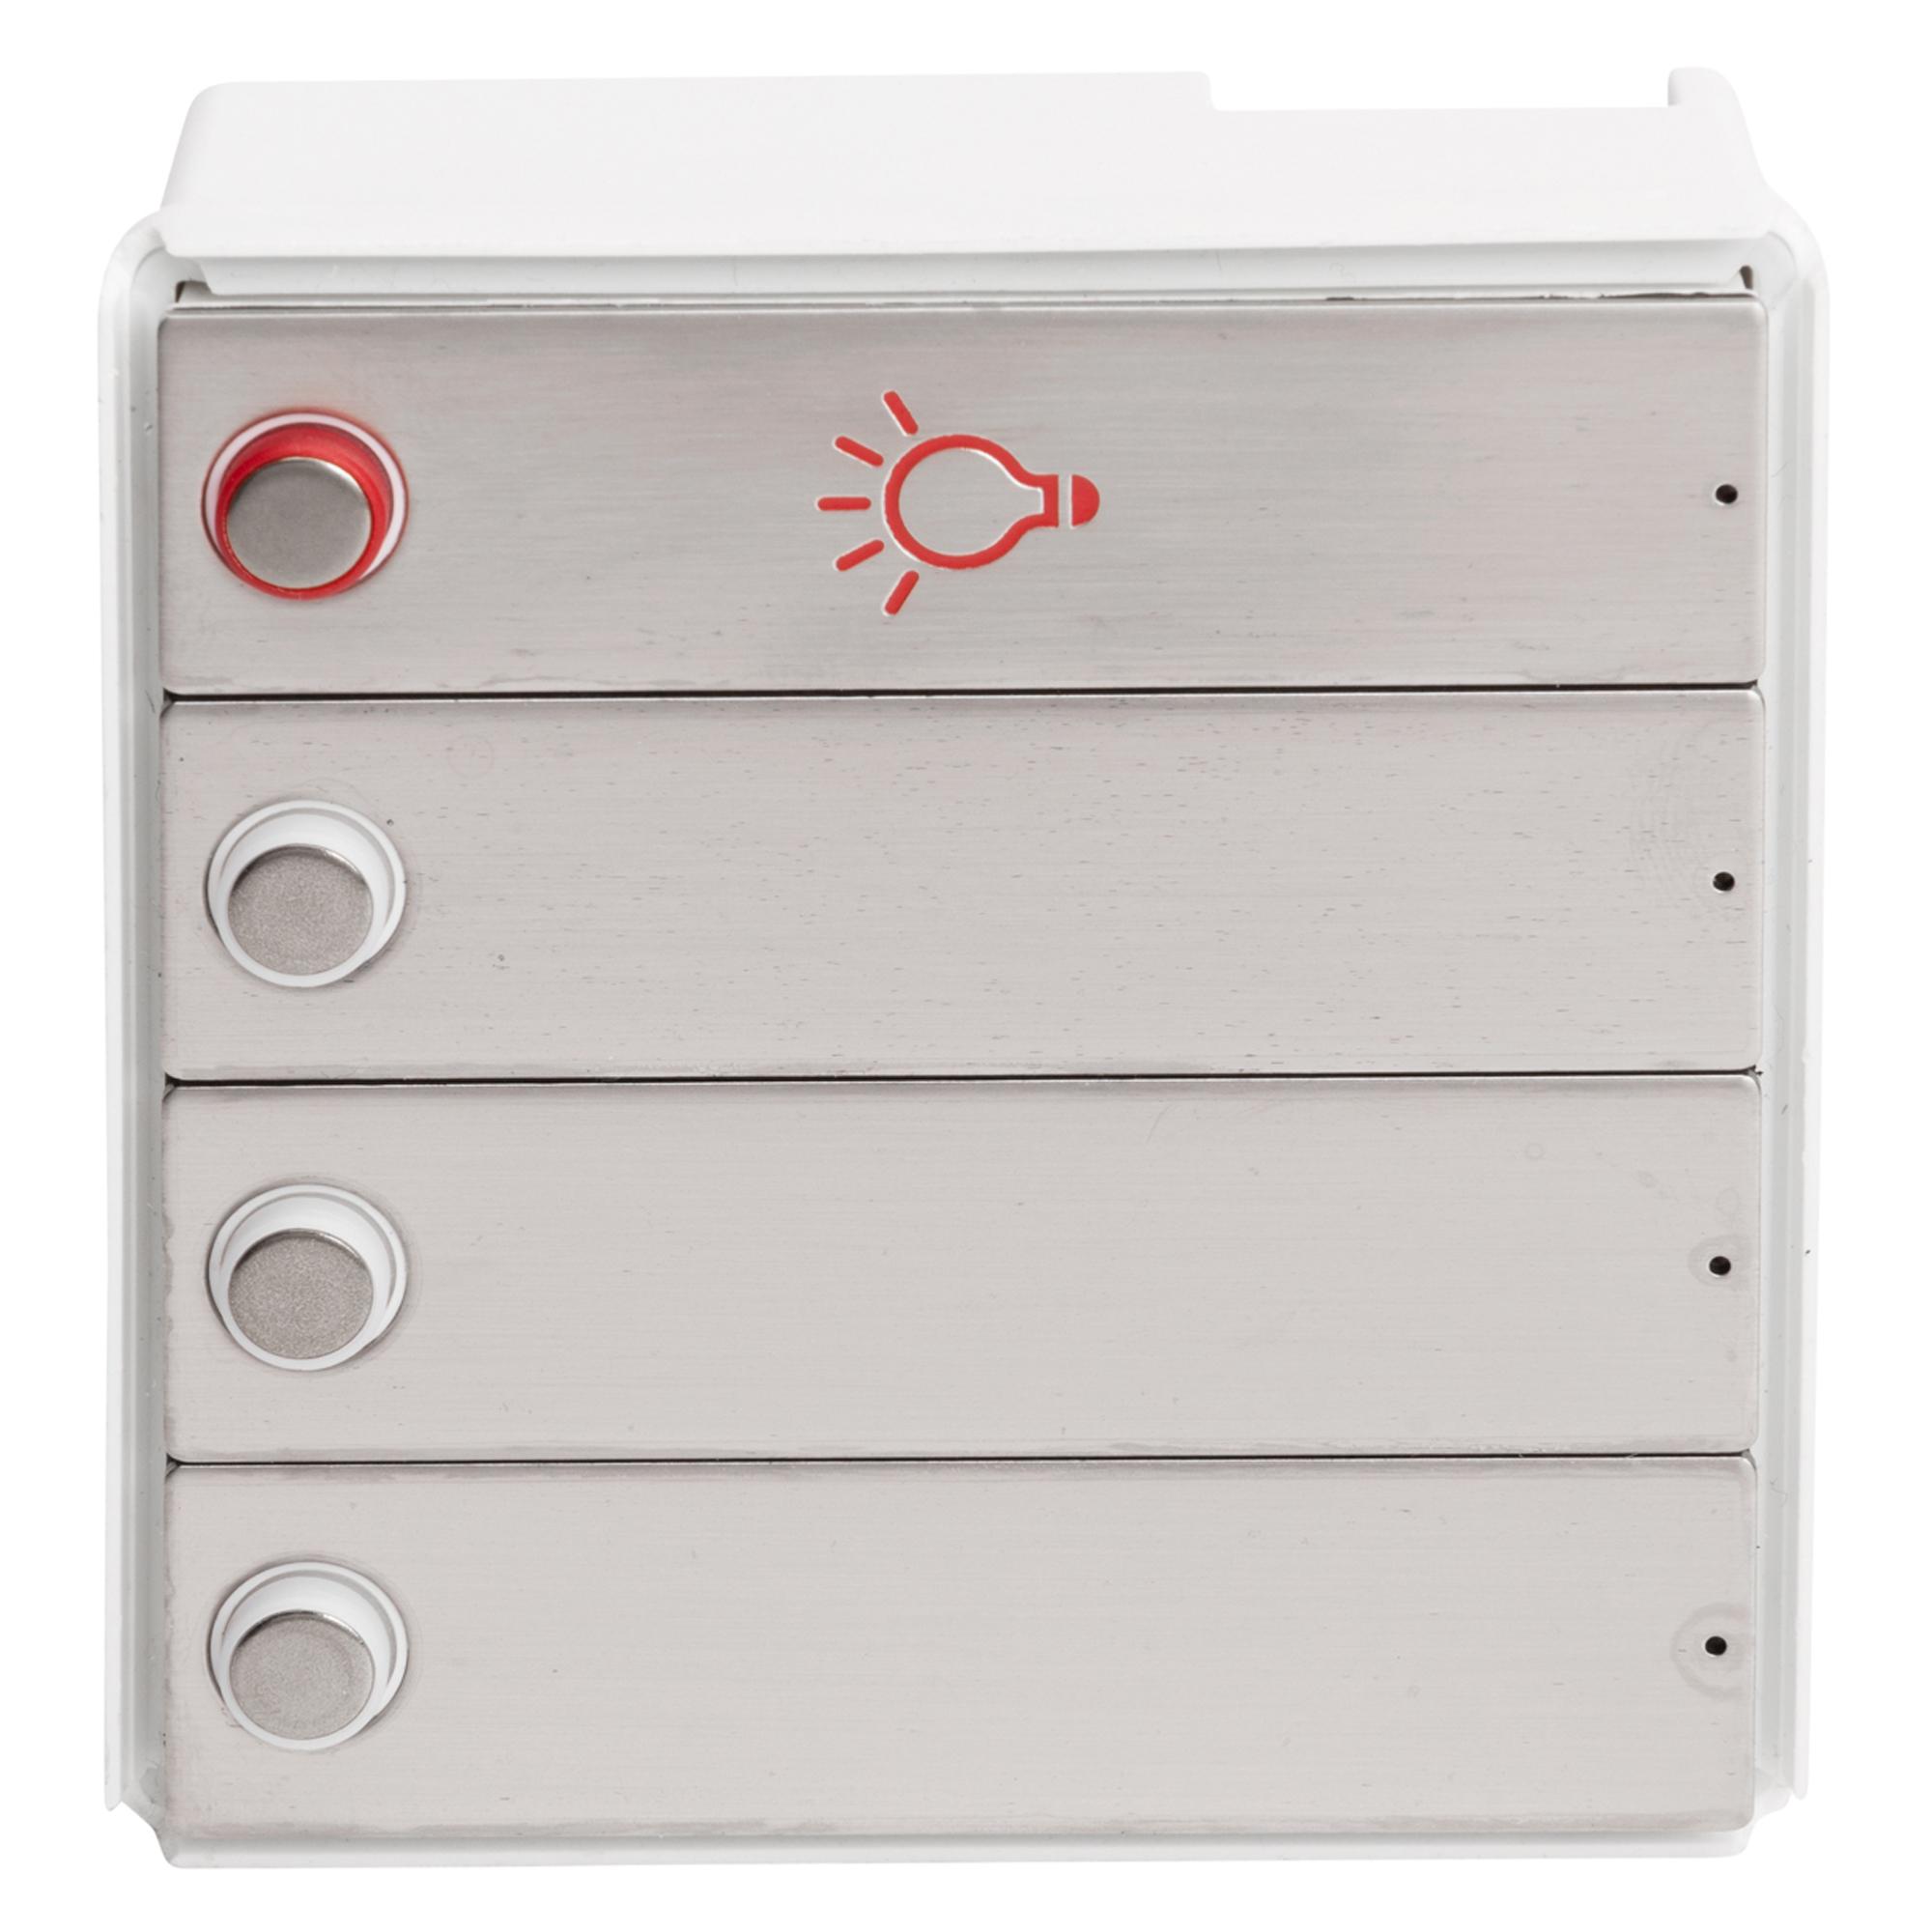 RENZ Tastenmodul RSA2 kompakt - 3 Klingel- & 1 Lichttaster-Edelstahl 97-9-85326